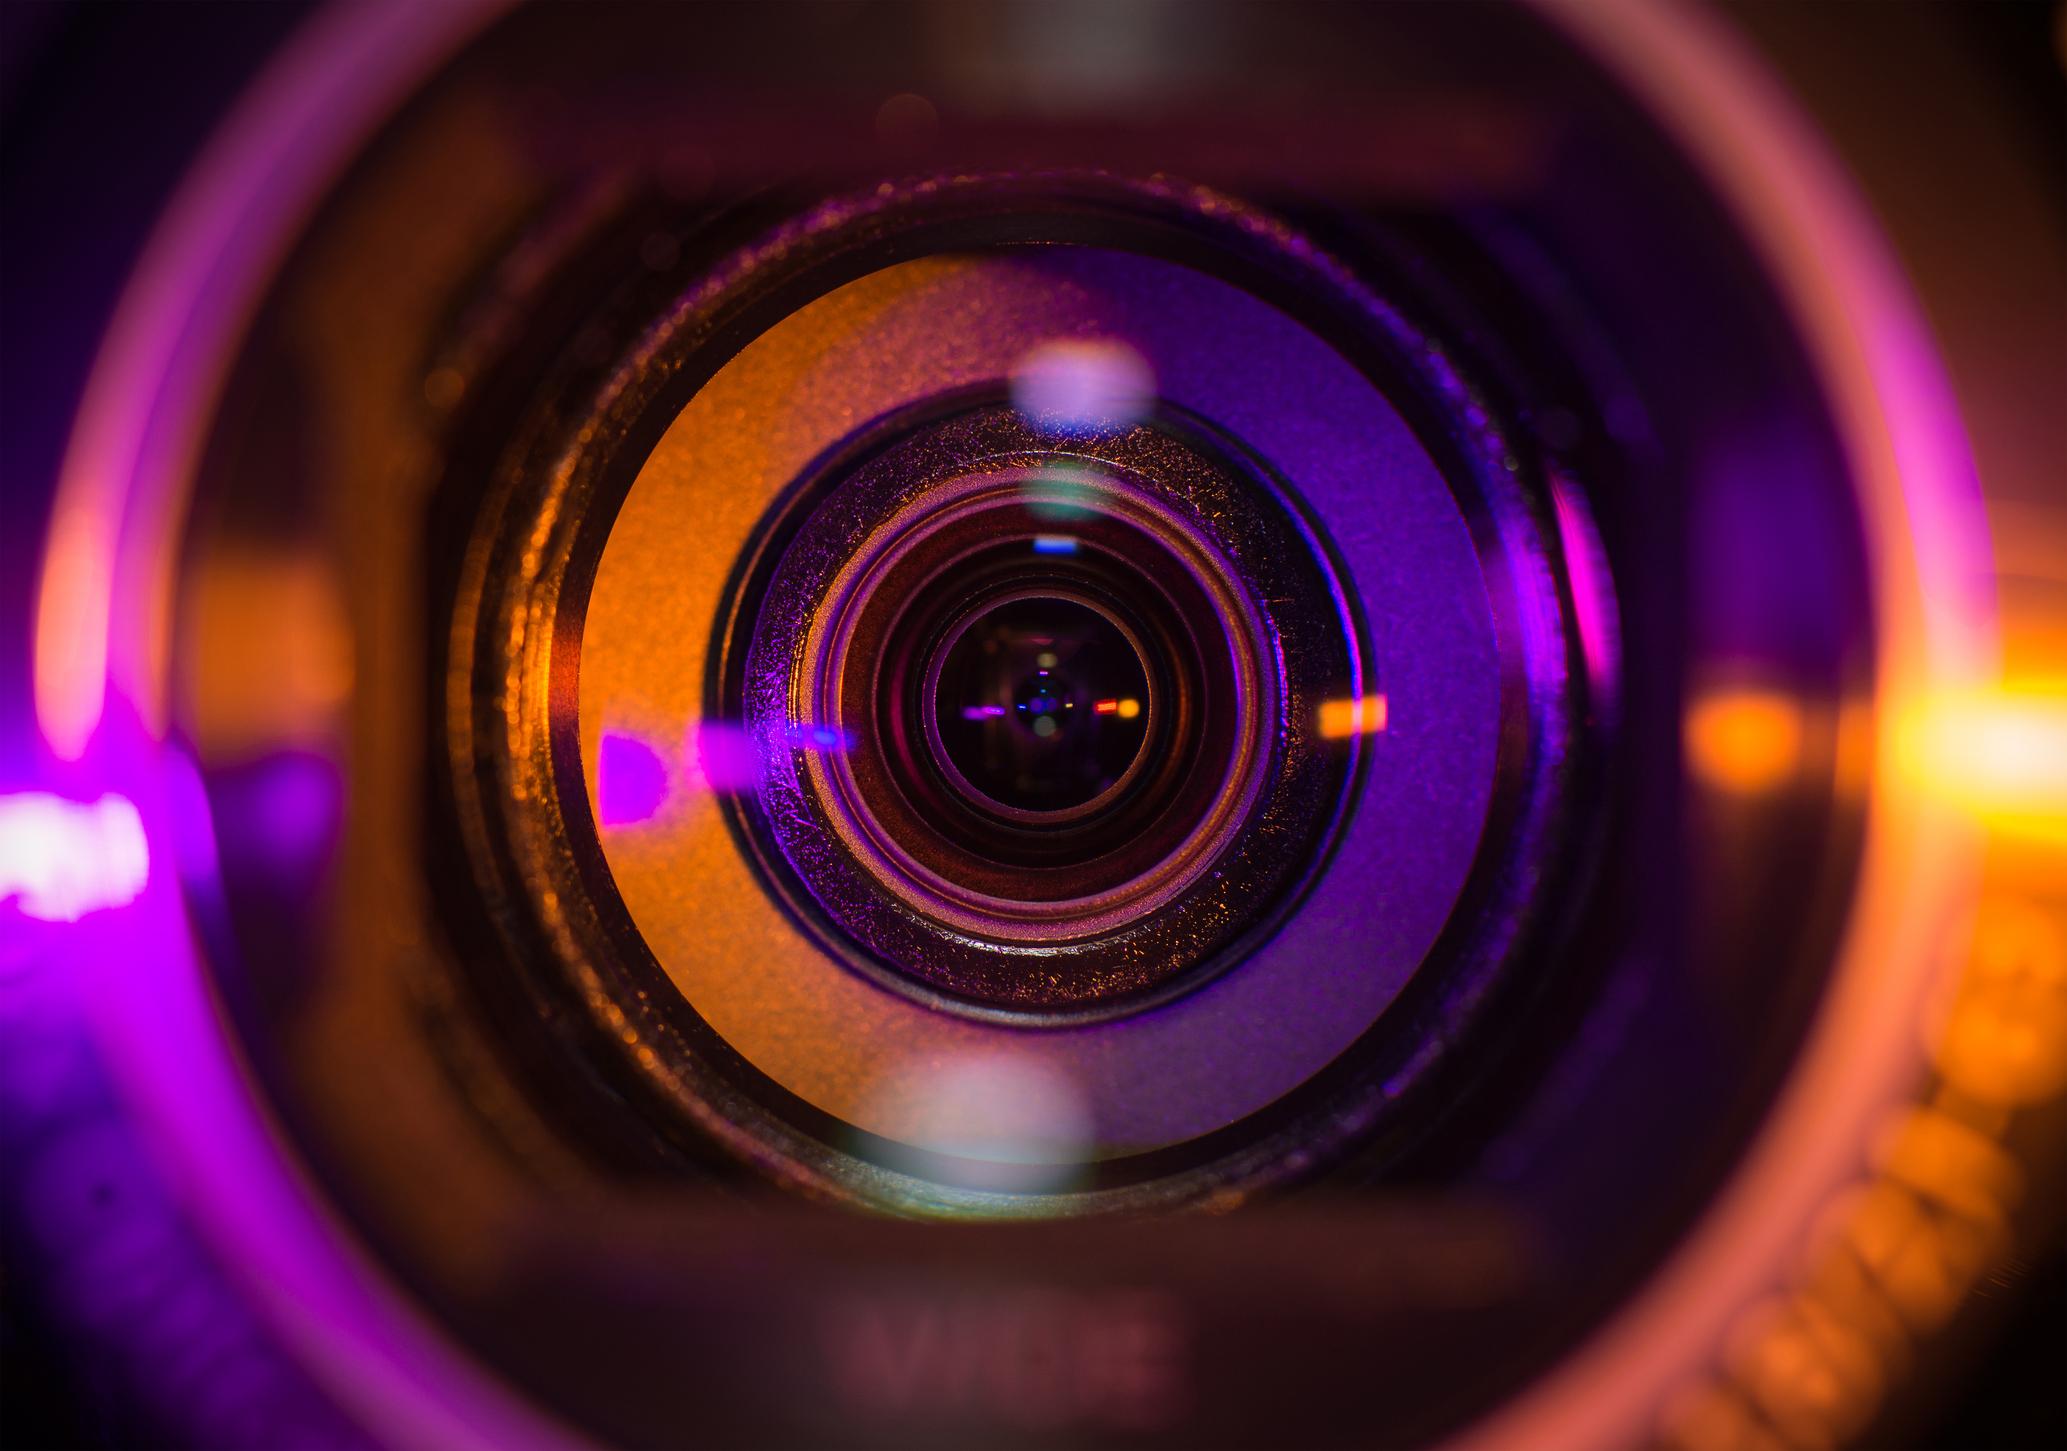 Video camera lens lit in orange and purple